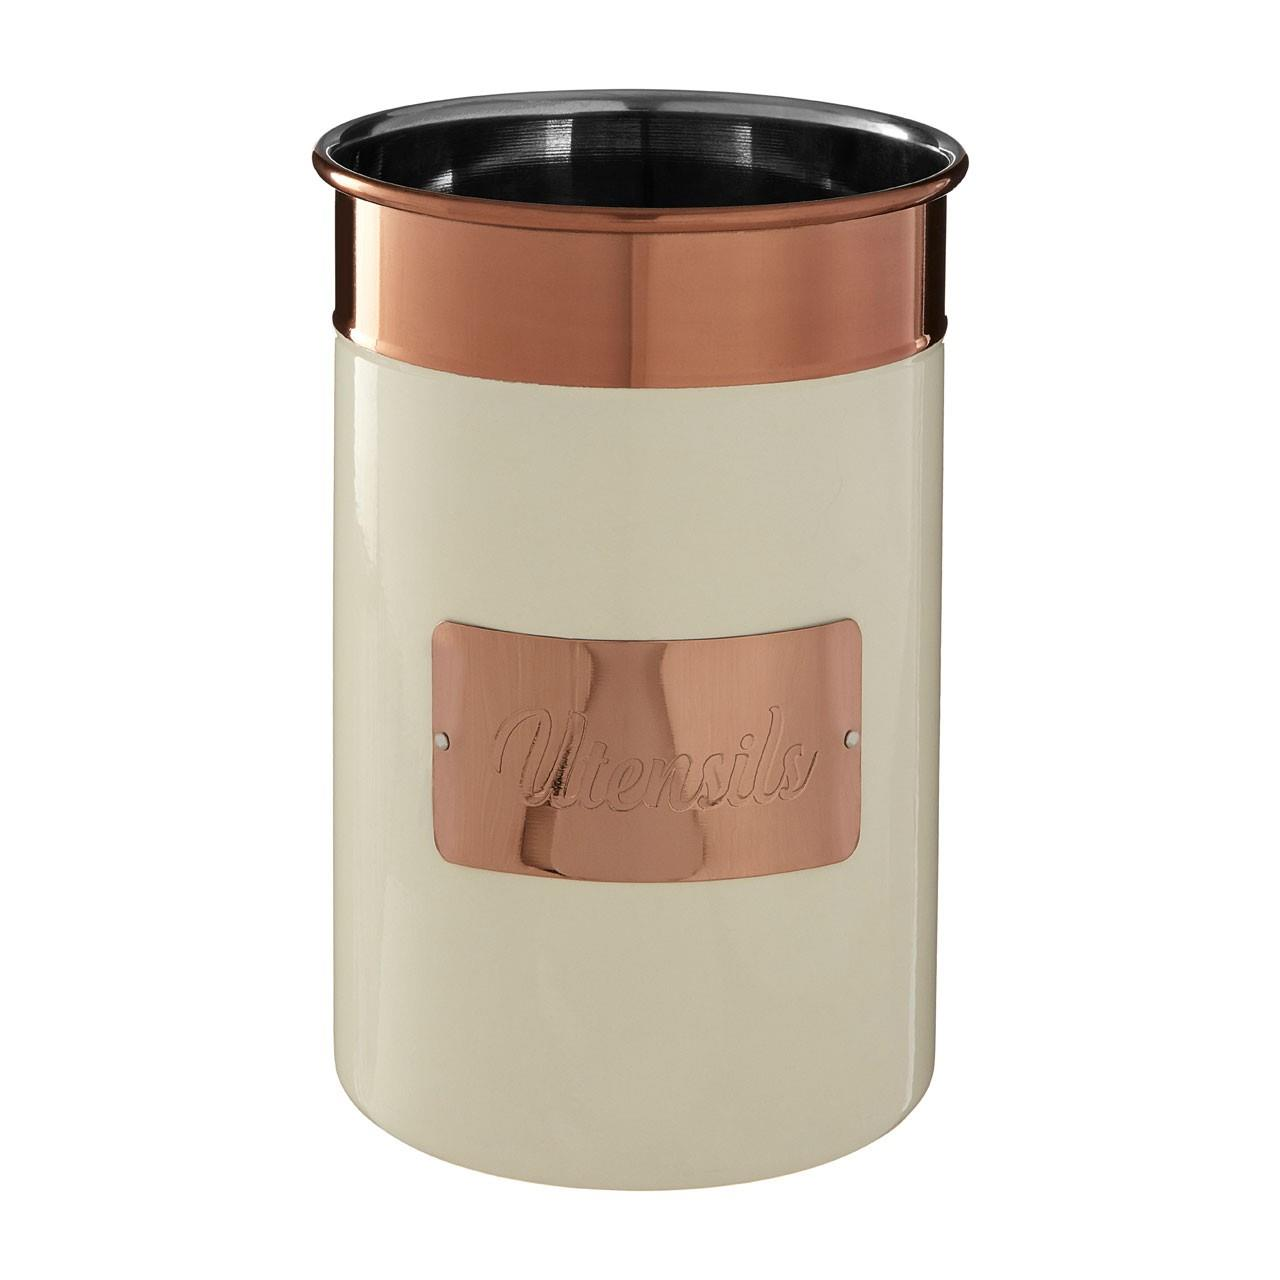 Prescott-Cream-Copper-Bread-Bin-Biscuit-Sugar-Coffee-Canister-Utensil-Holder thumbnail 3